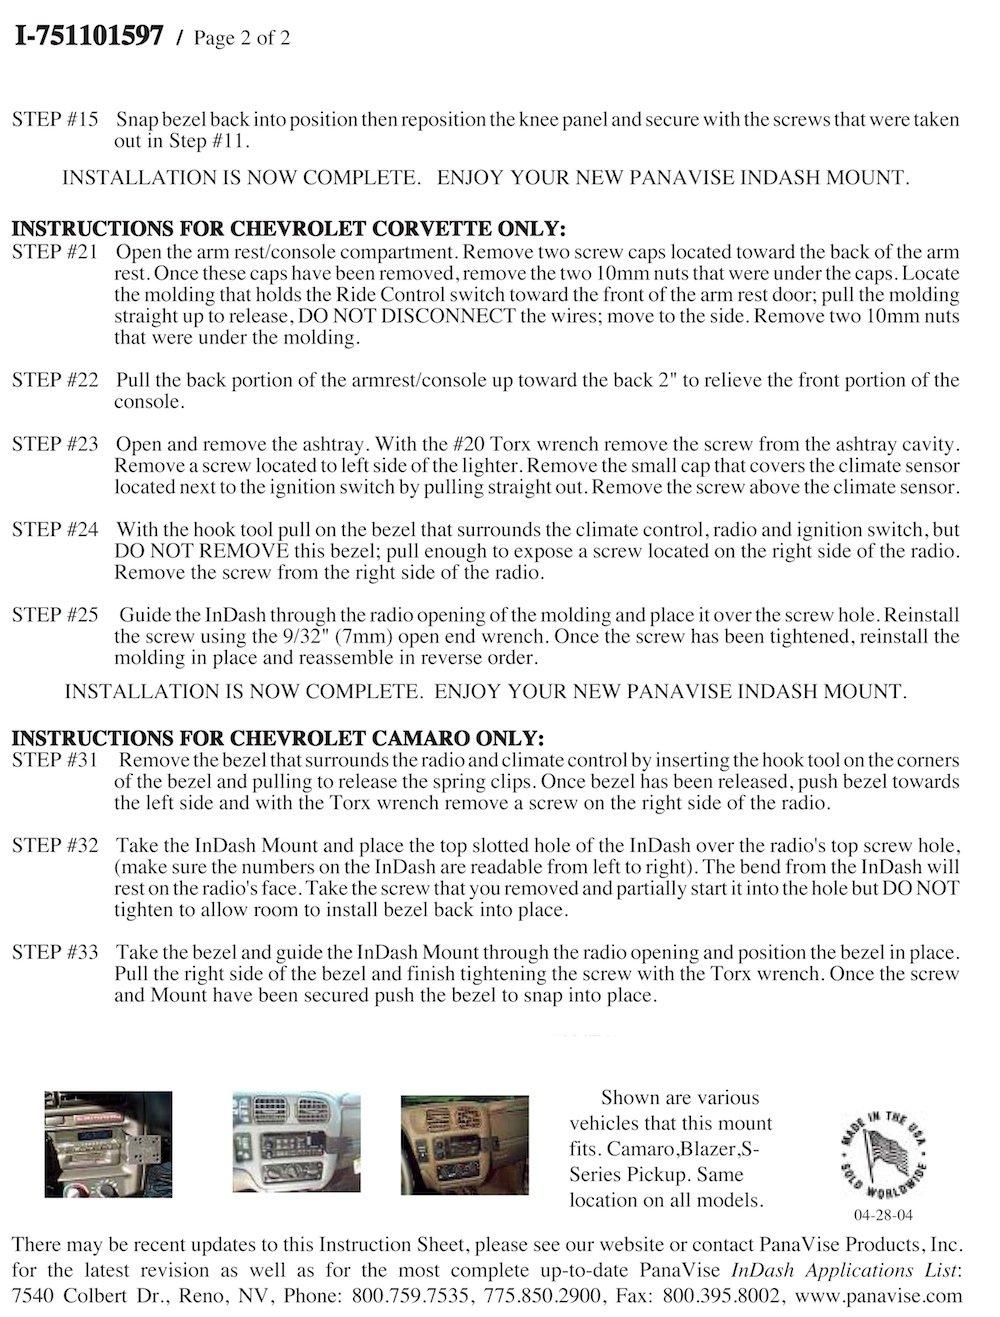 Padholdr Utility Series Premium Locking Tablet Dash Kit for 1998-2002 GMC Jimmy and Sonoma